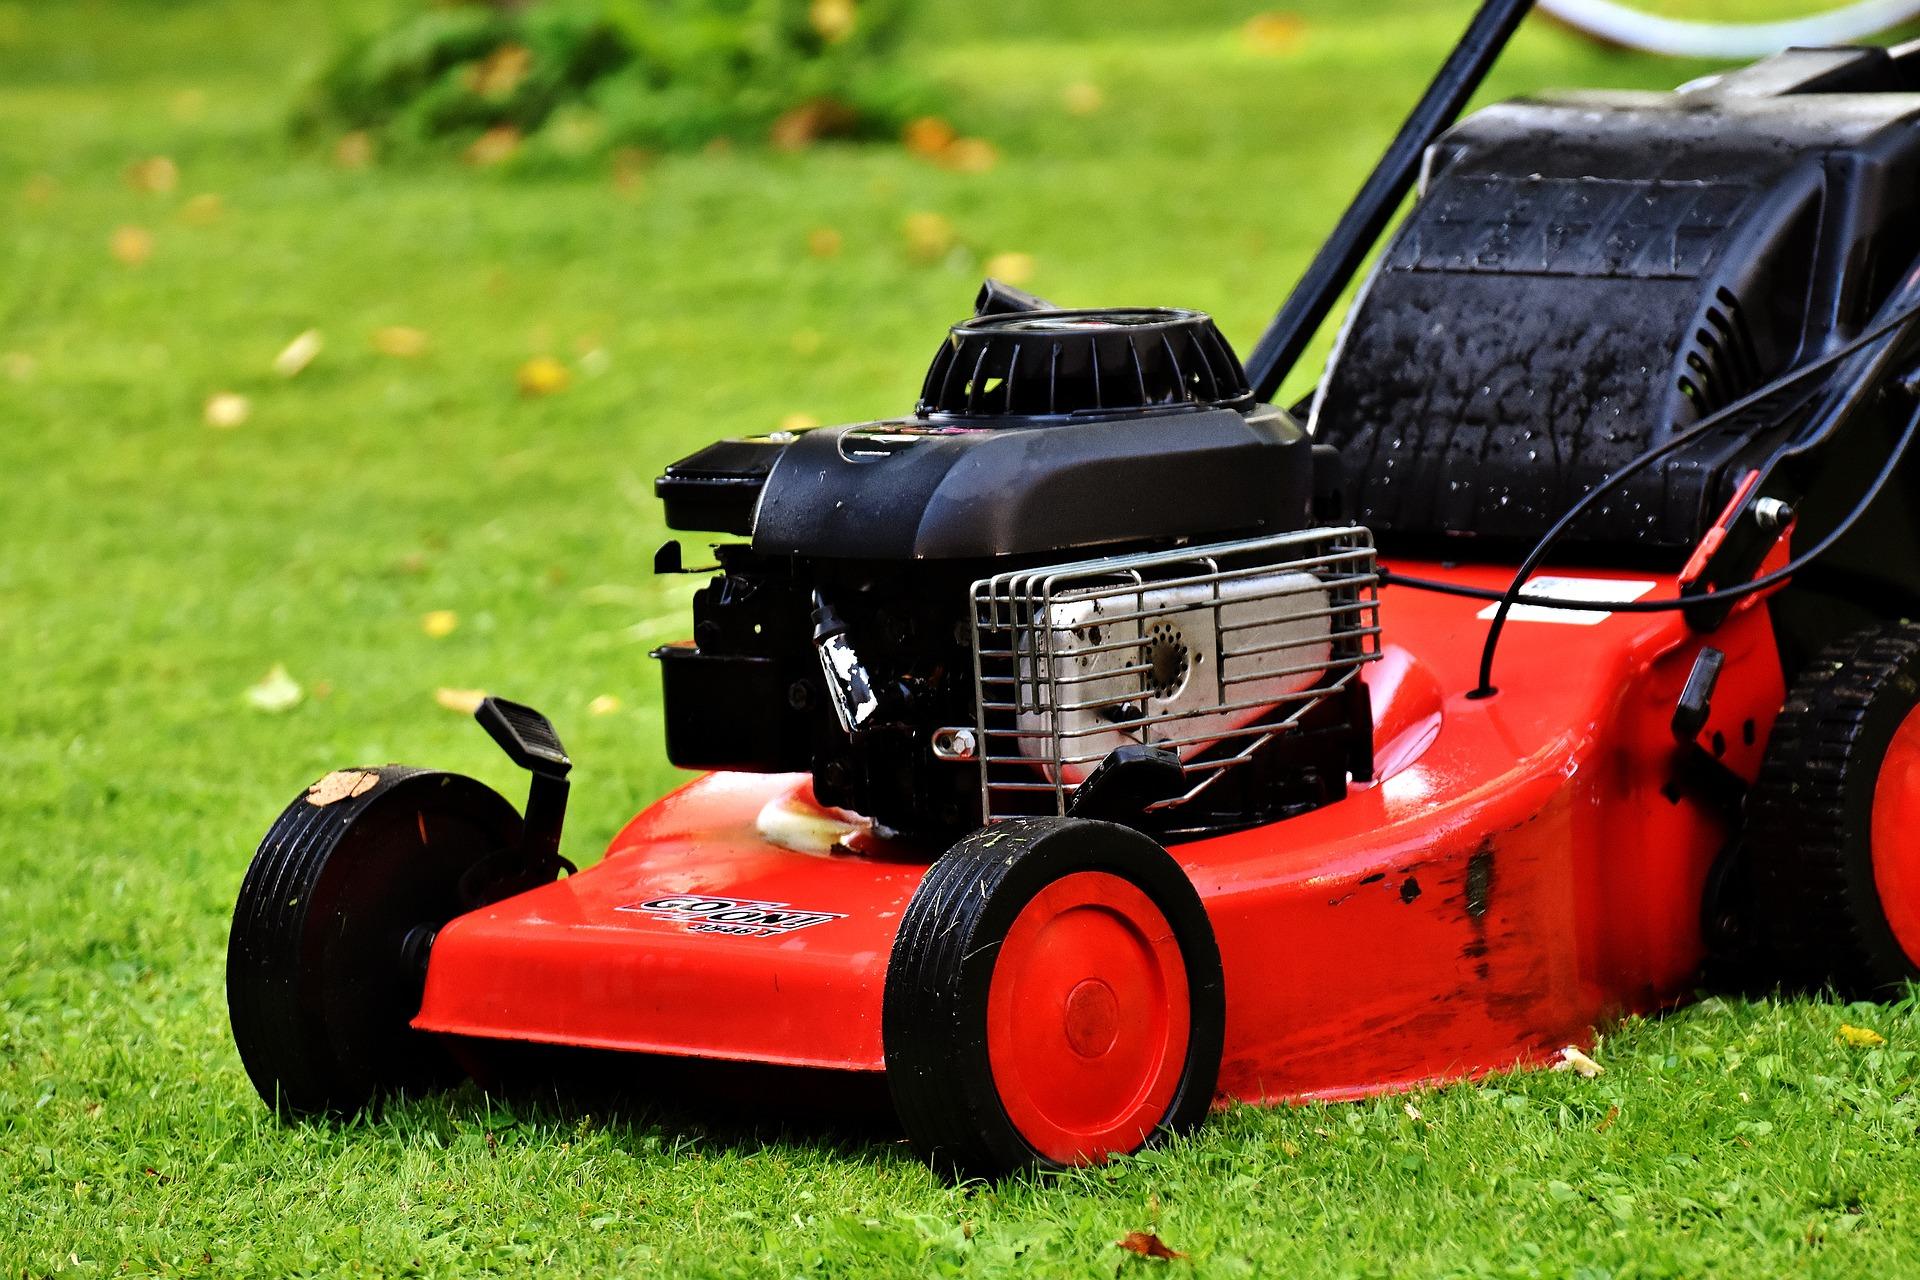 , Lawn Mower Repair Guide, Best Garden, Home And DIY Tips